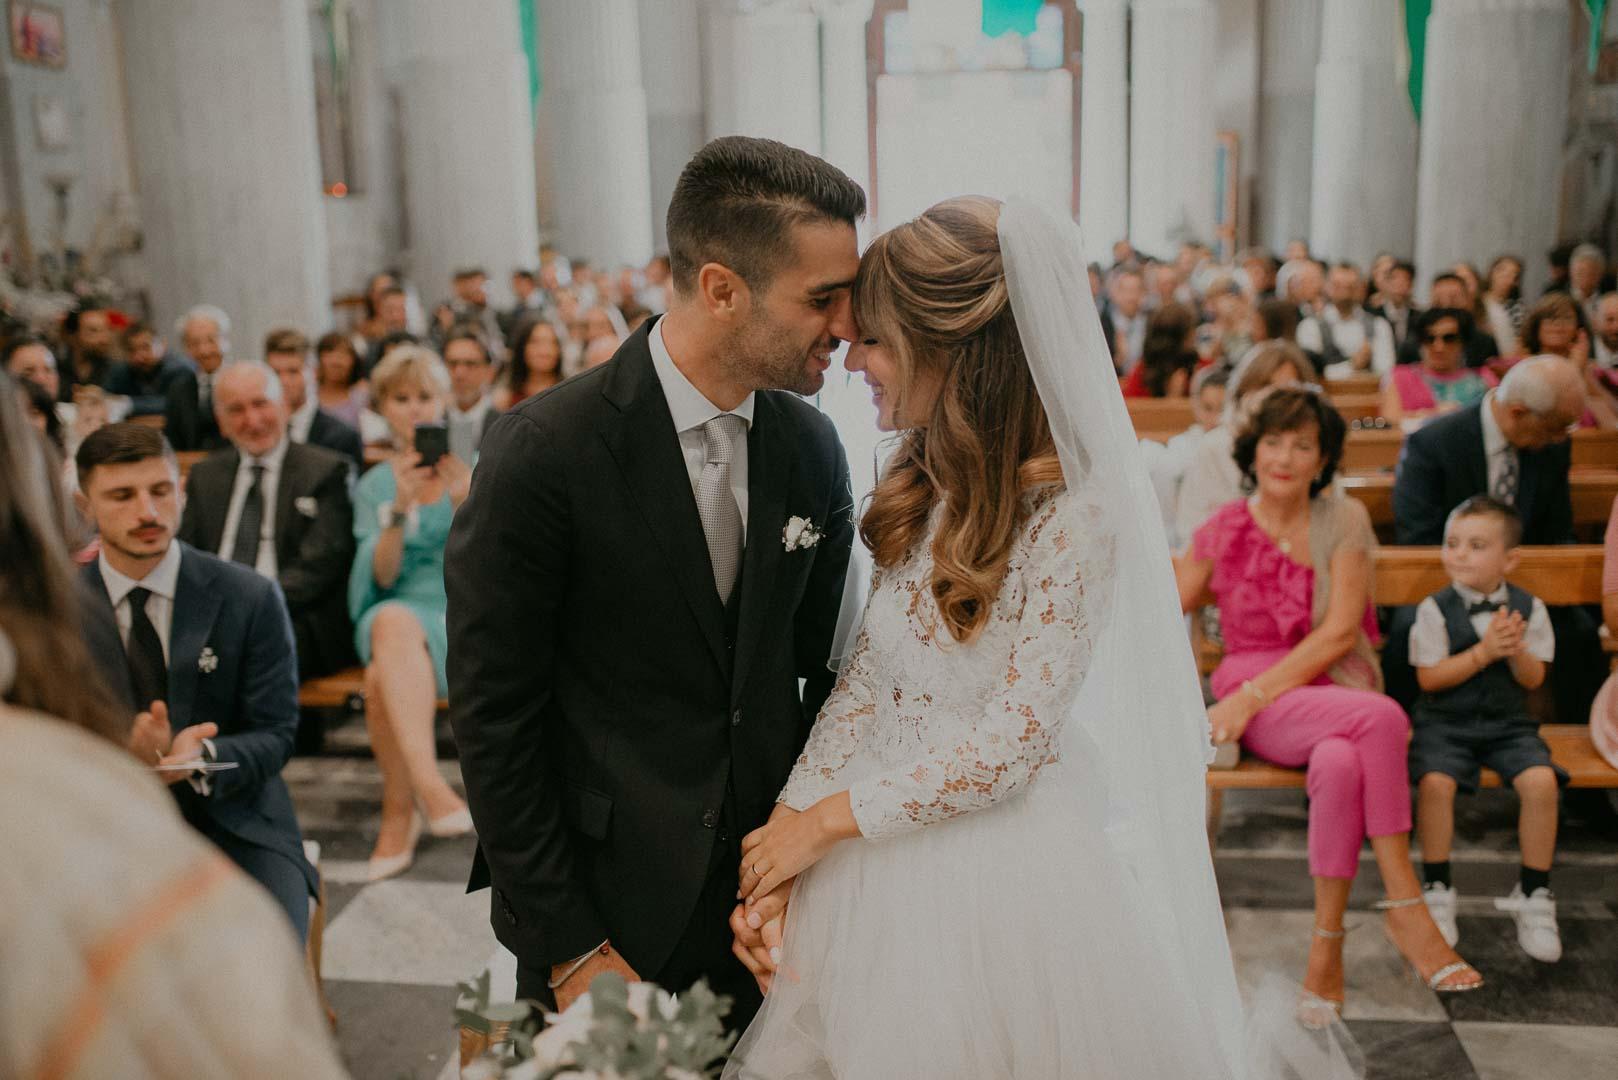 wedding-photographer-destination-fineart-bespoke-reportage-napoli-nabilah-vivianeizzo-spazio46-71